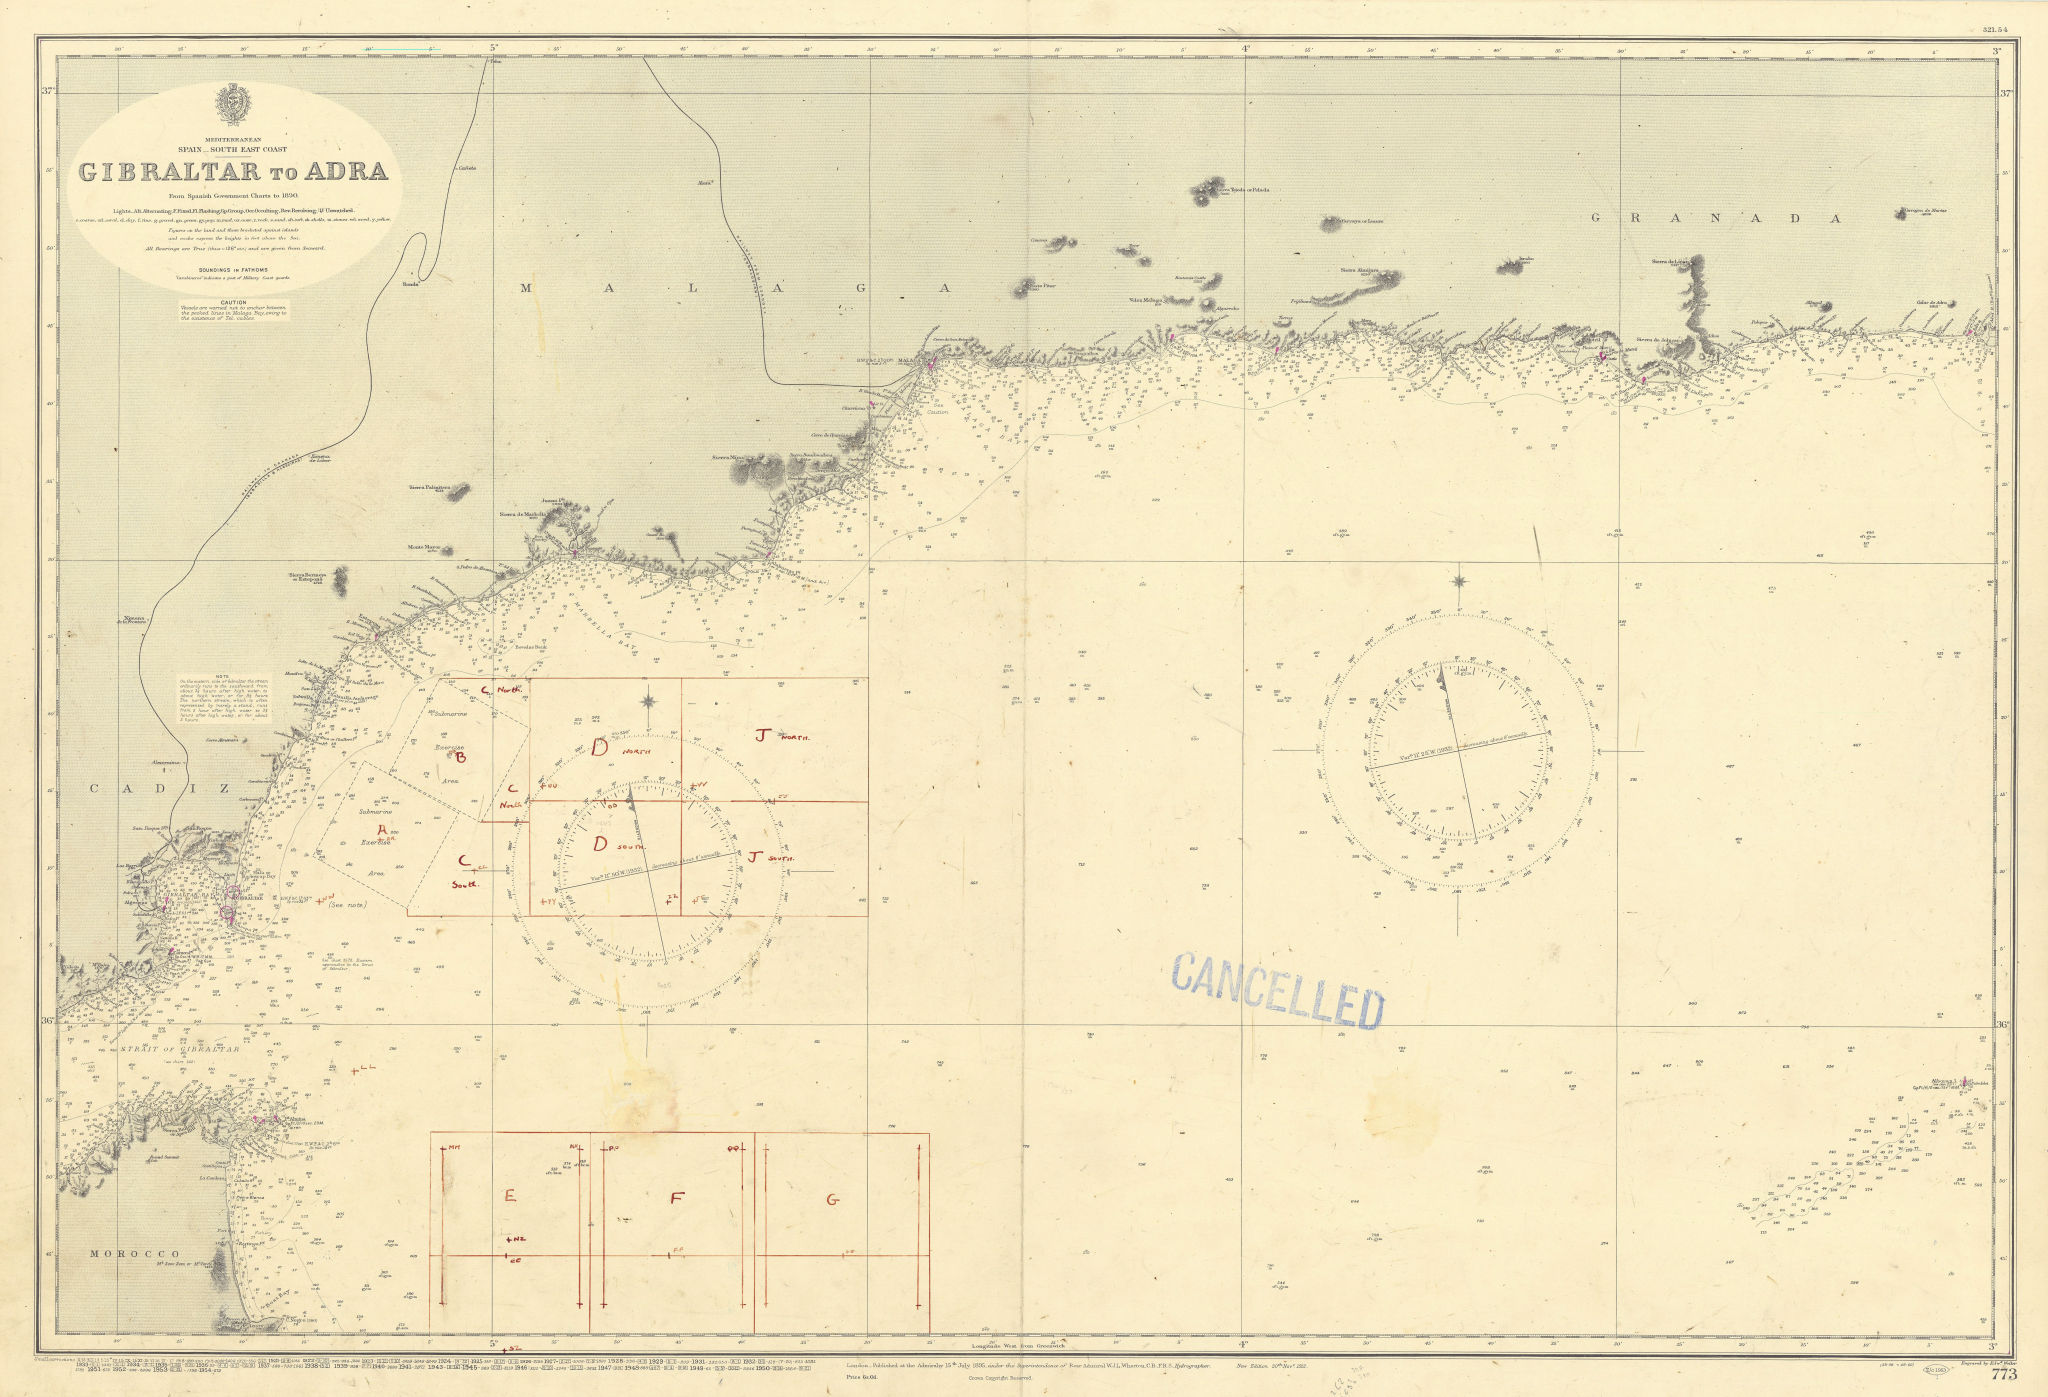 Spain SE coast Gibraltar-Adra Andalusia Malaga ADMIRALTY chart 1895 (1954) map